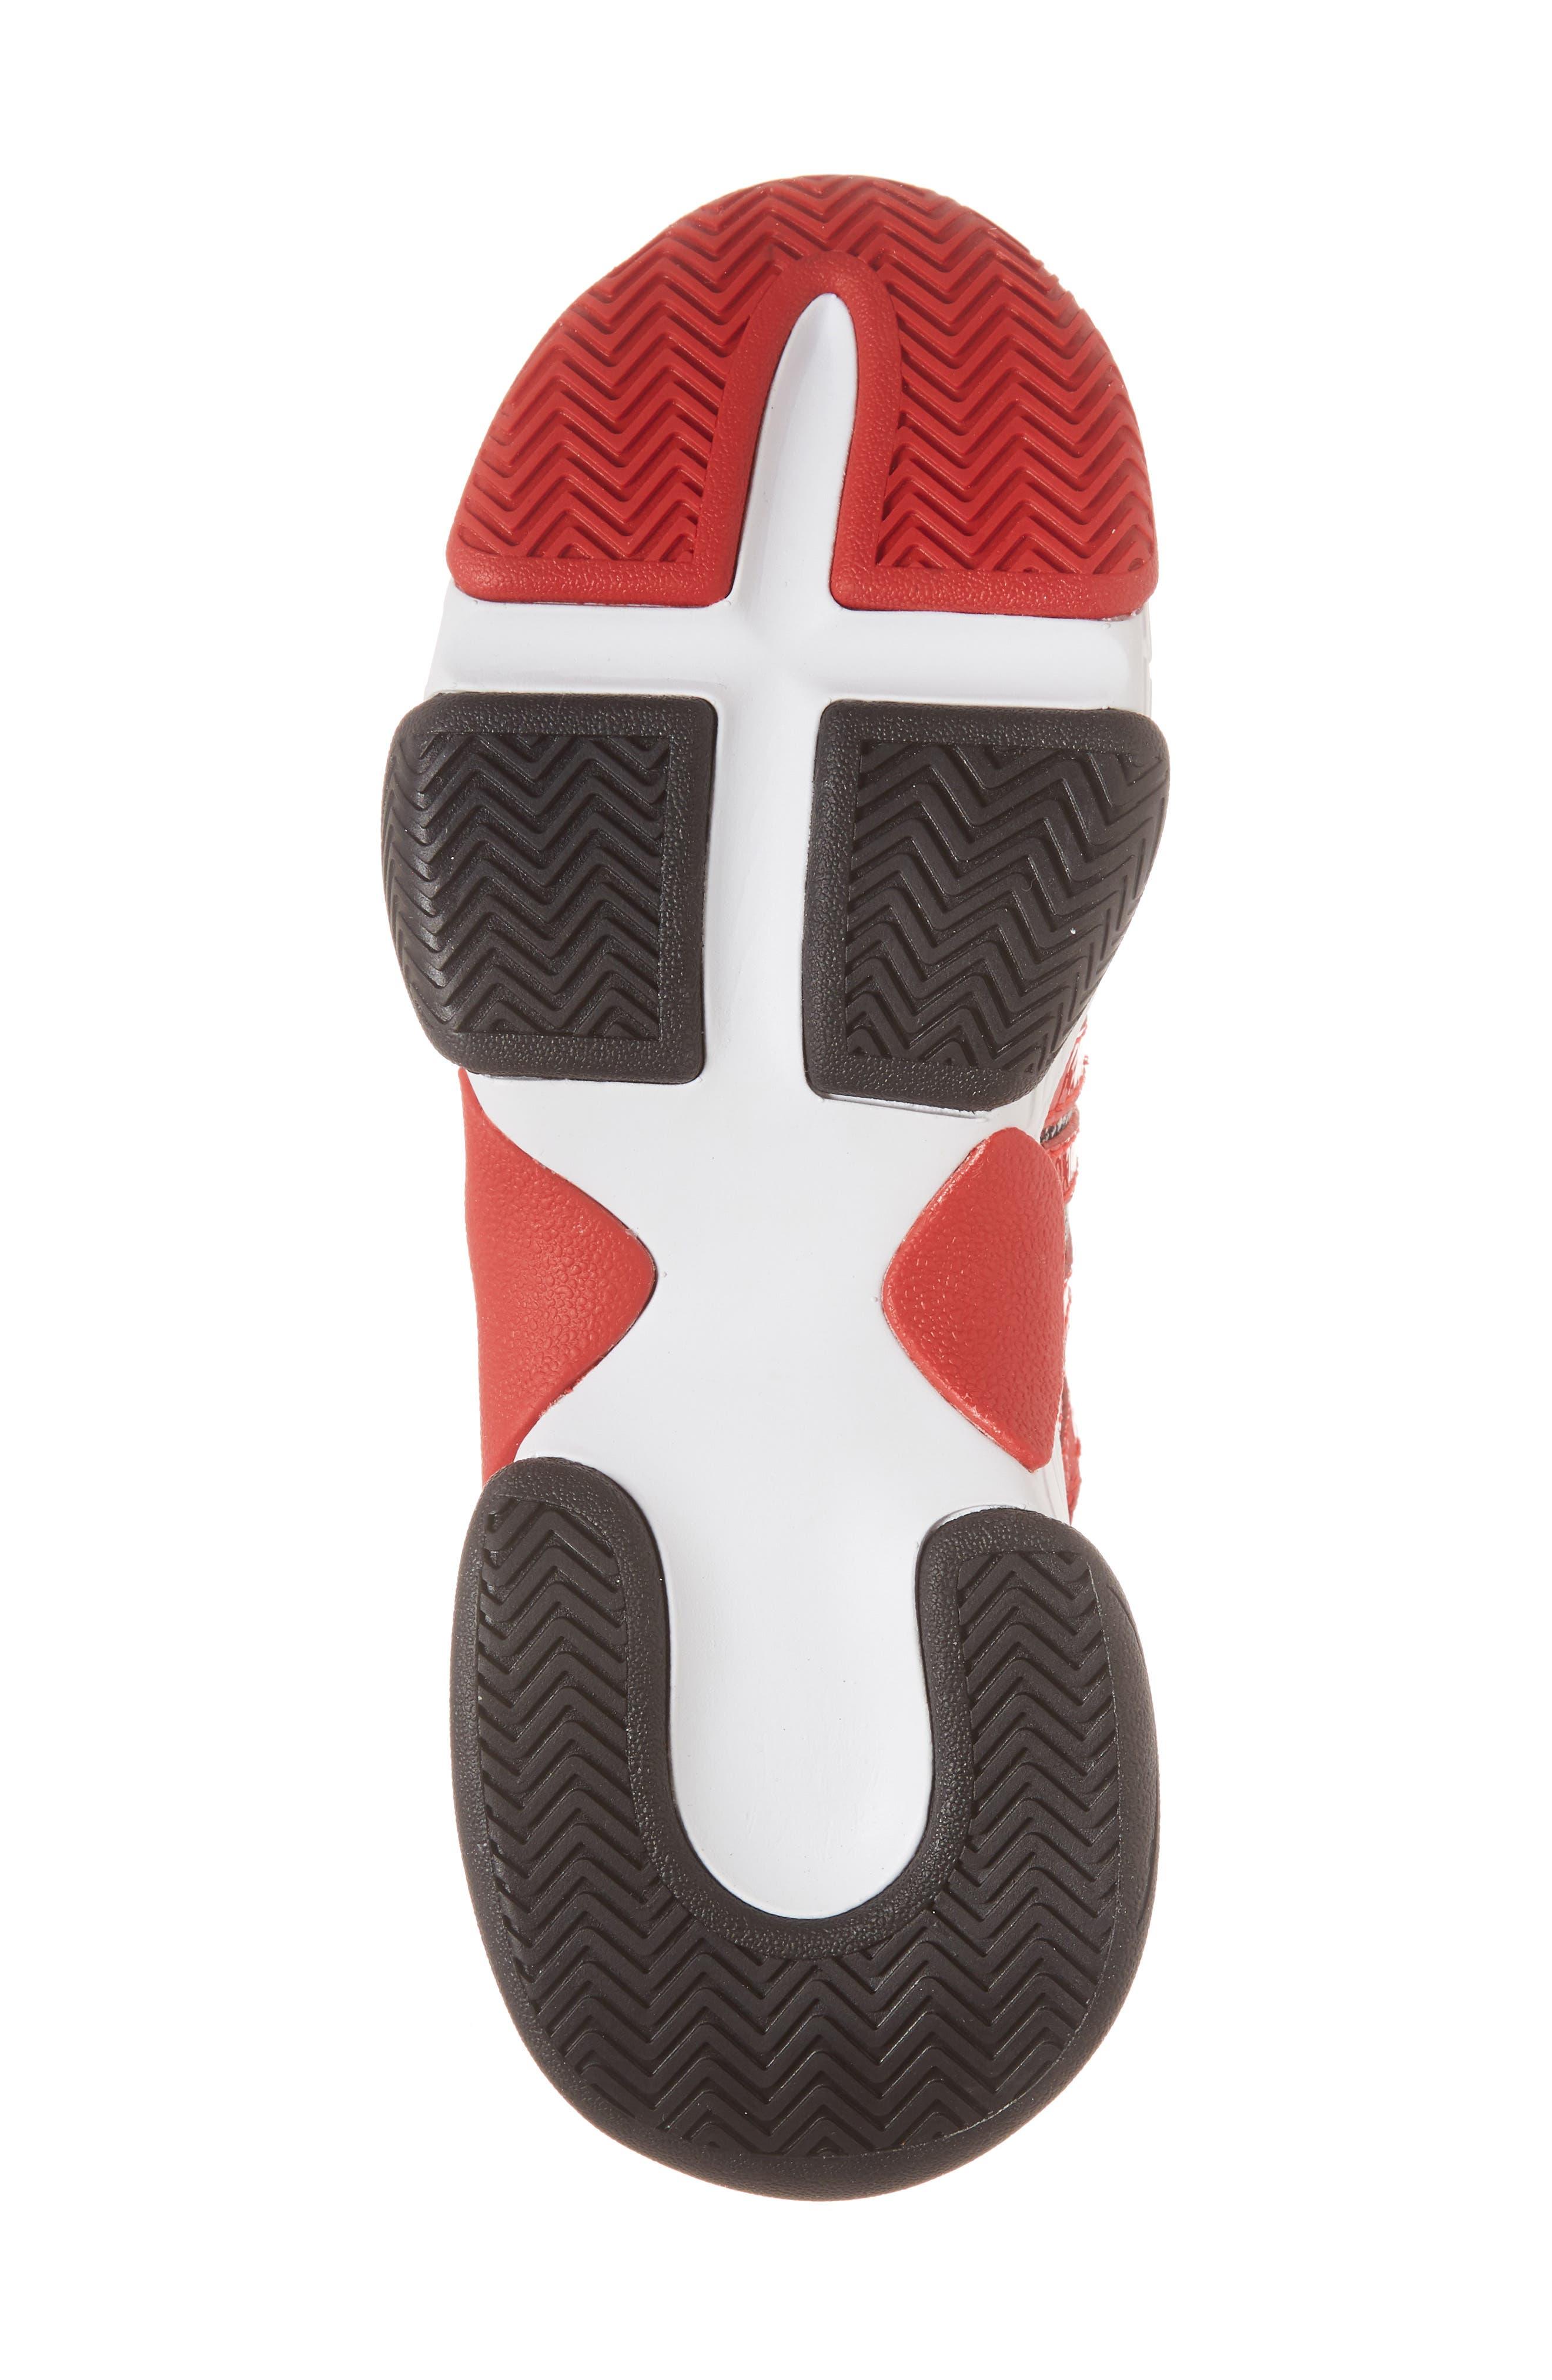 WiFi Sneaker,                             Alternate thumbnail 6, color,                             Red Pat Plaid Multi